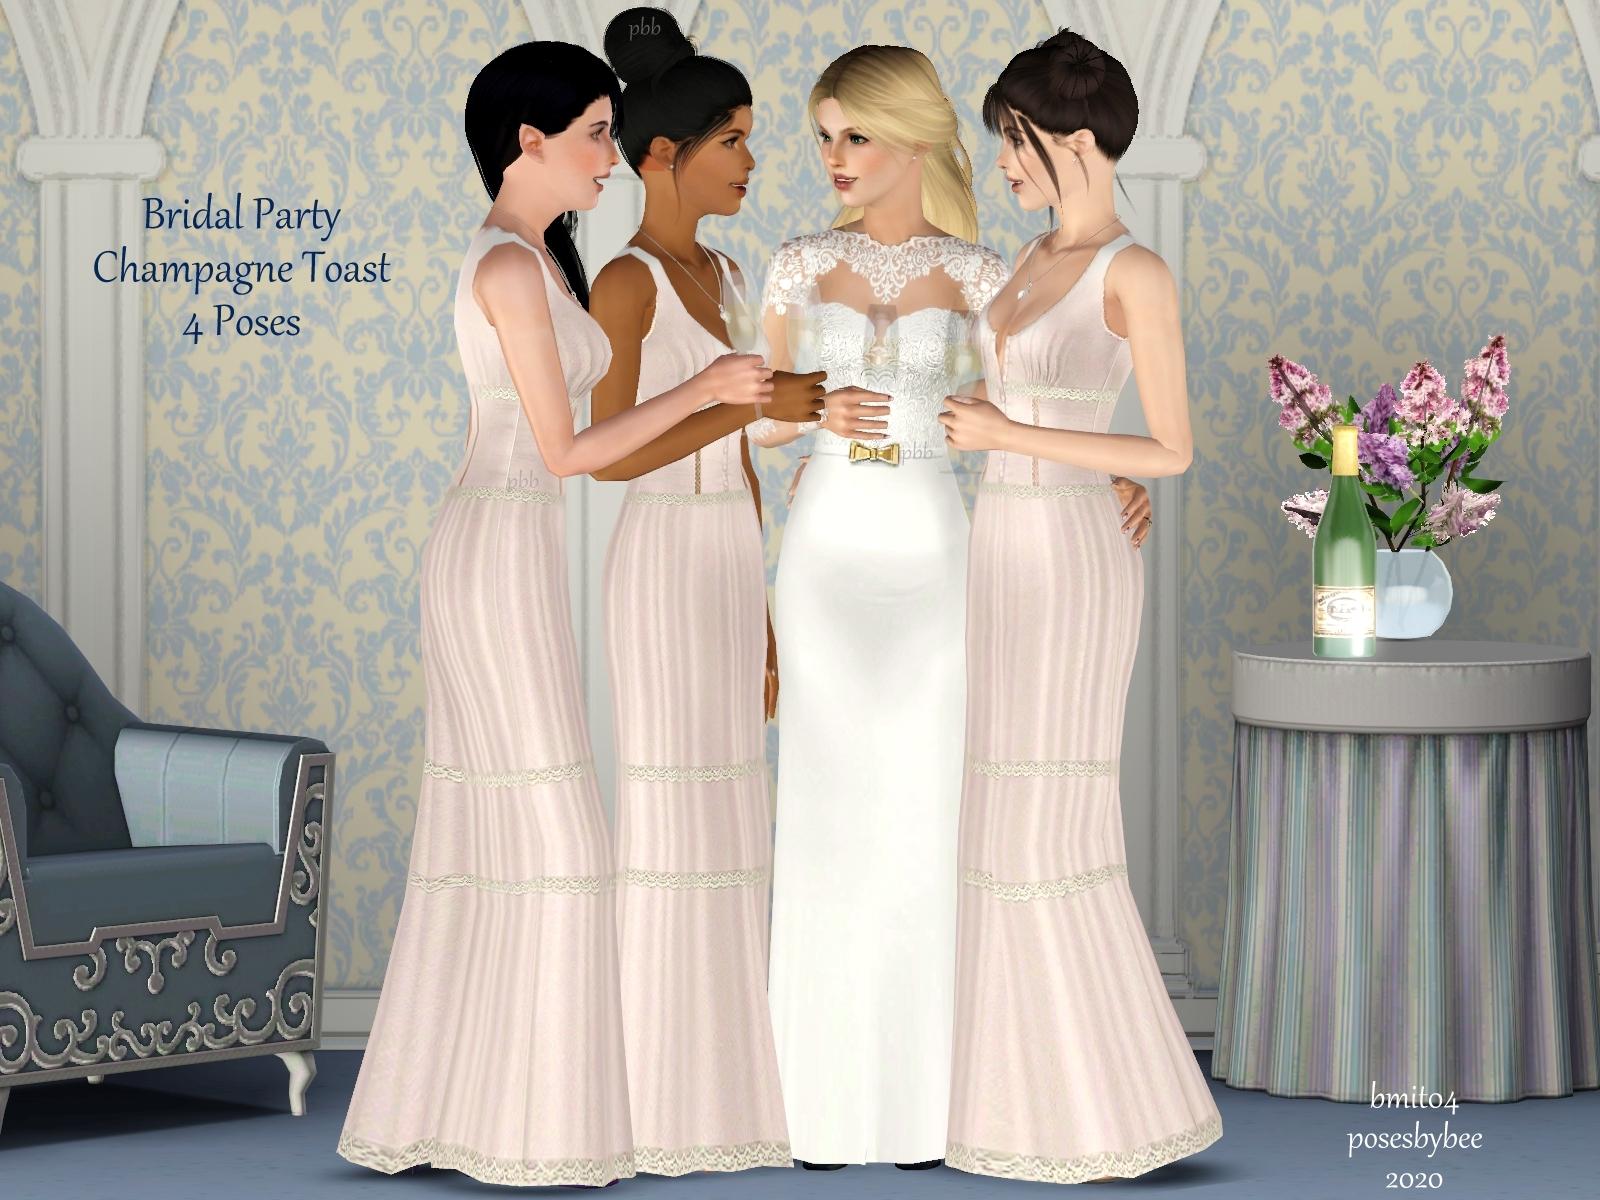 Champagne Toast 1-4